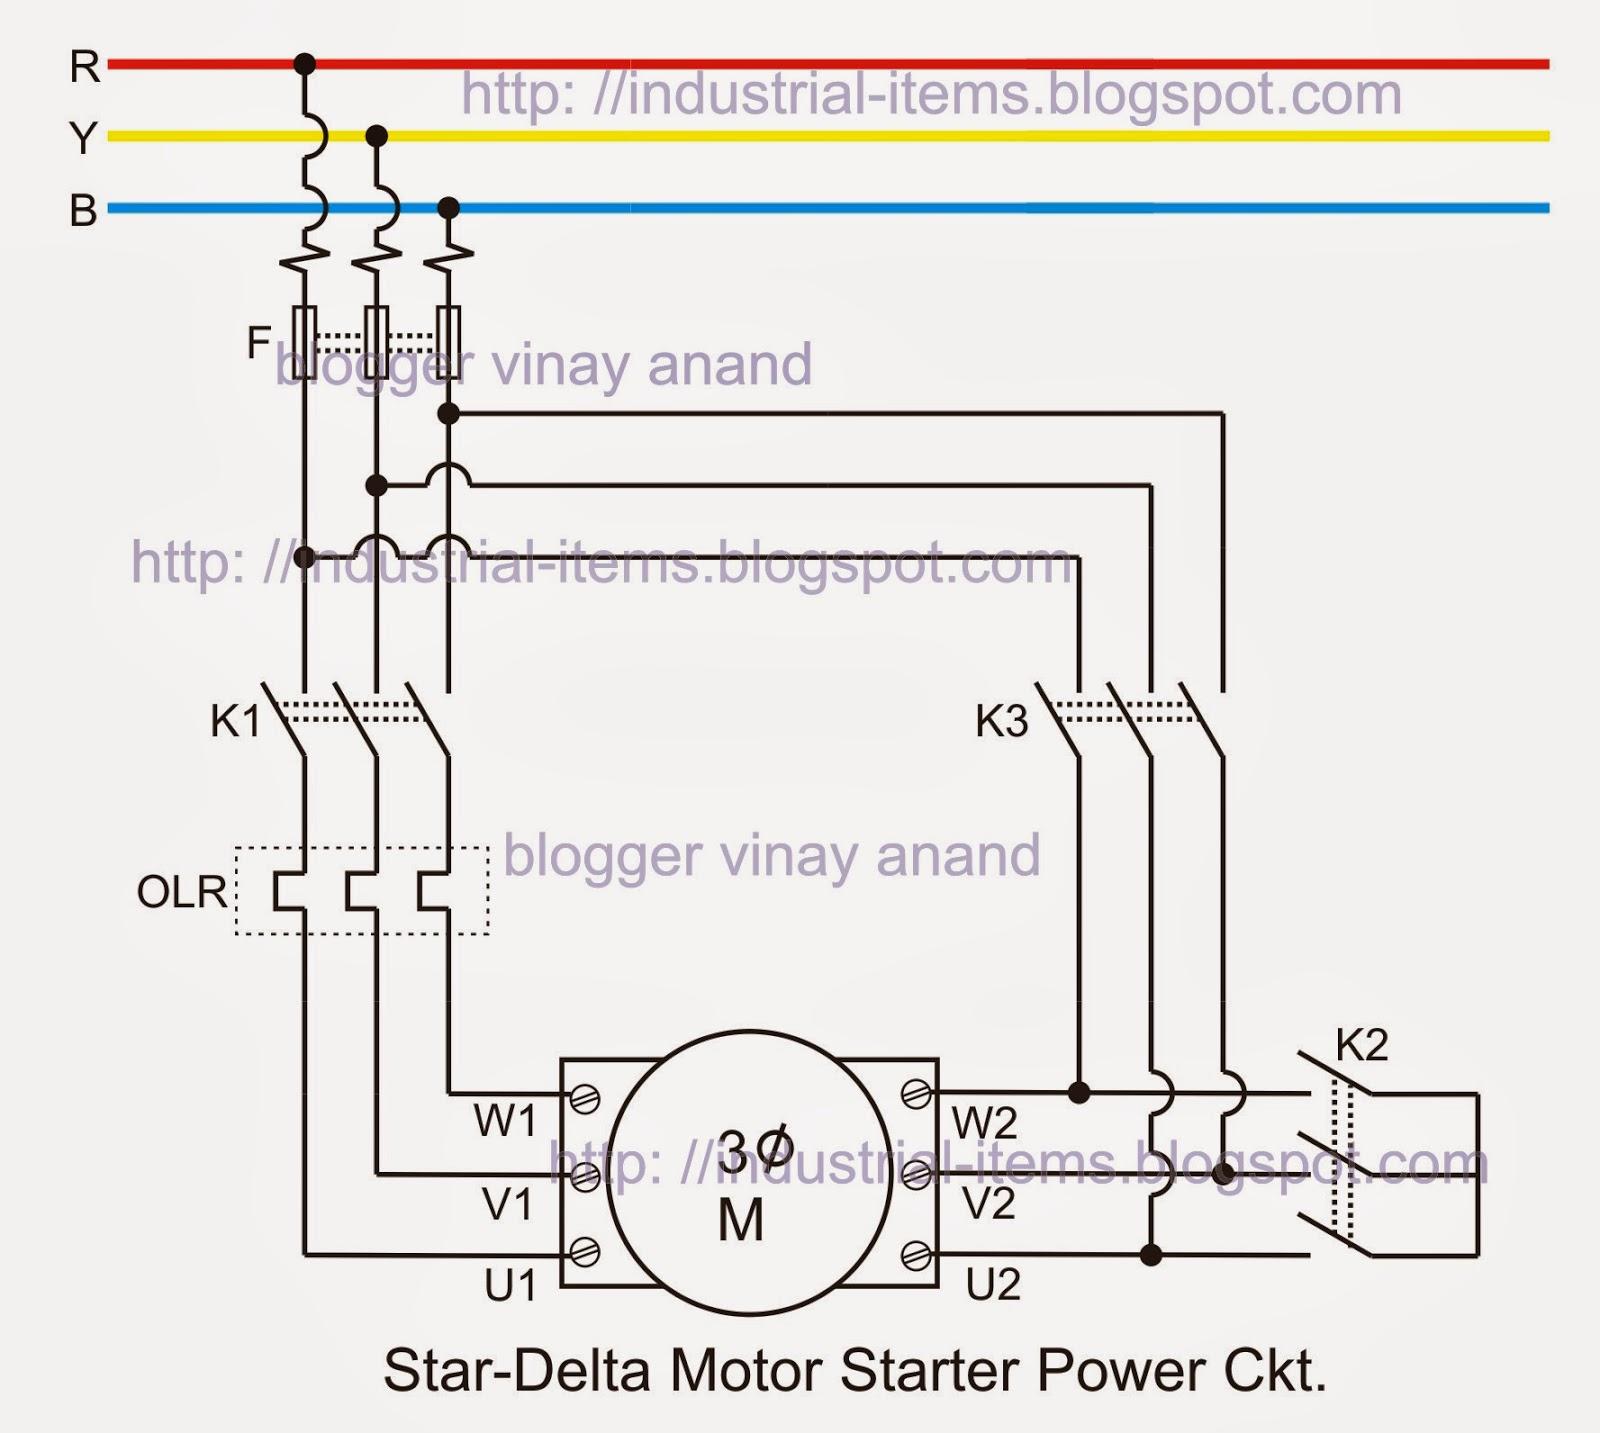 medium resolution of star delta starter power circuit of 3 phase induction motor